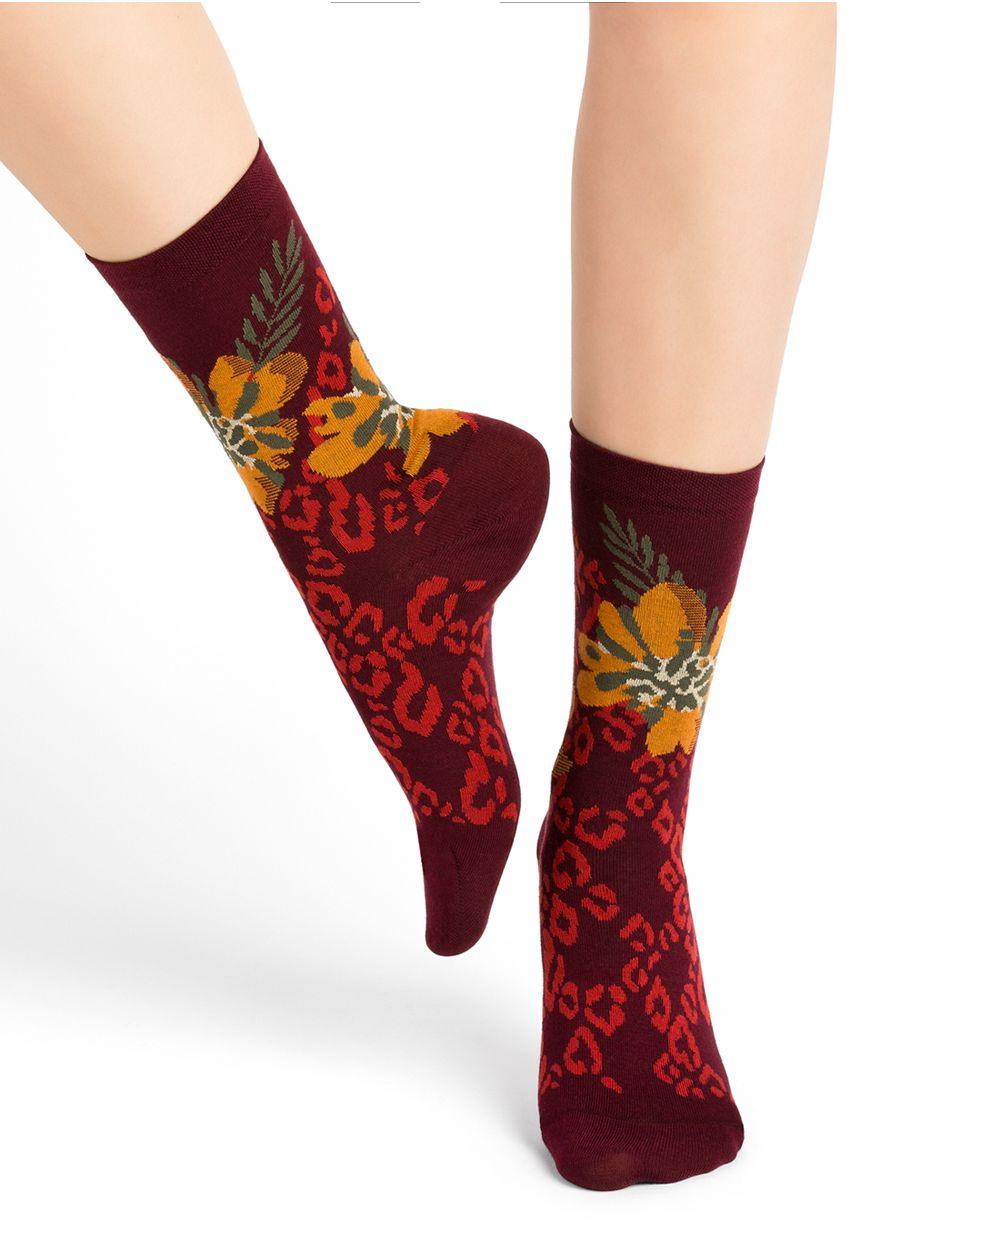 Panther pattern cotton socks